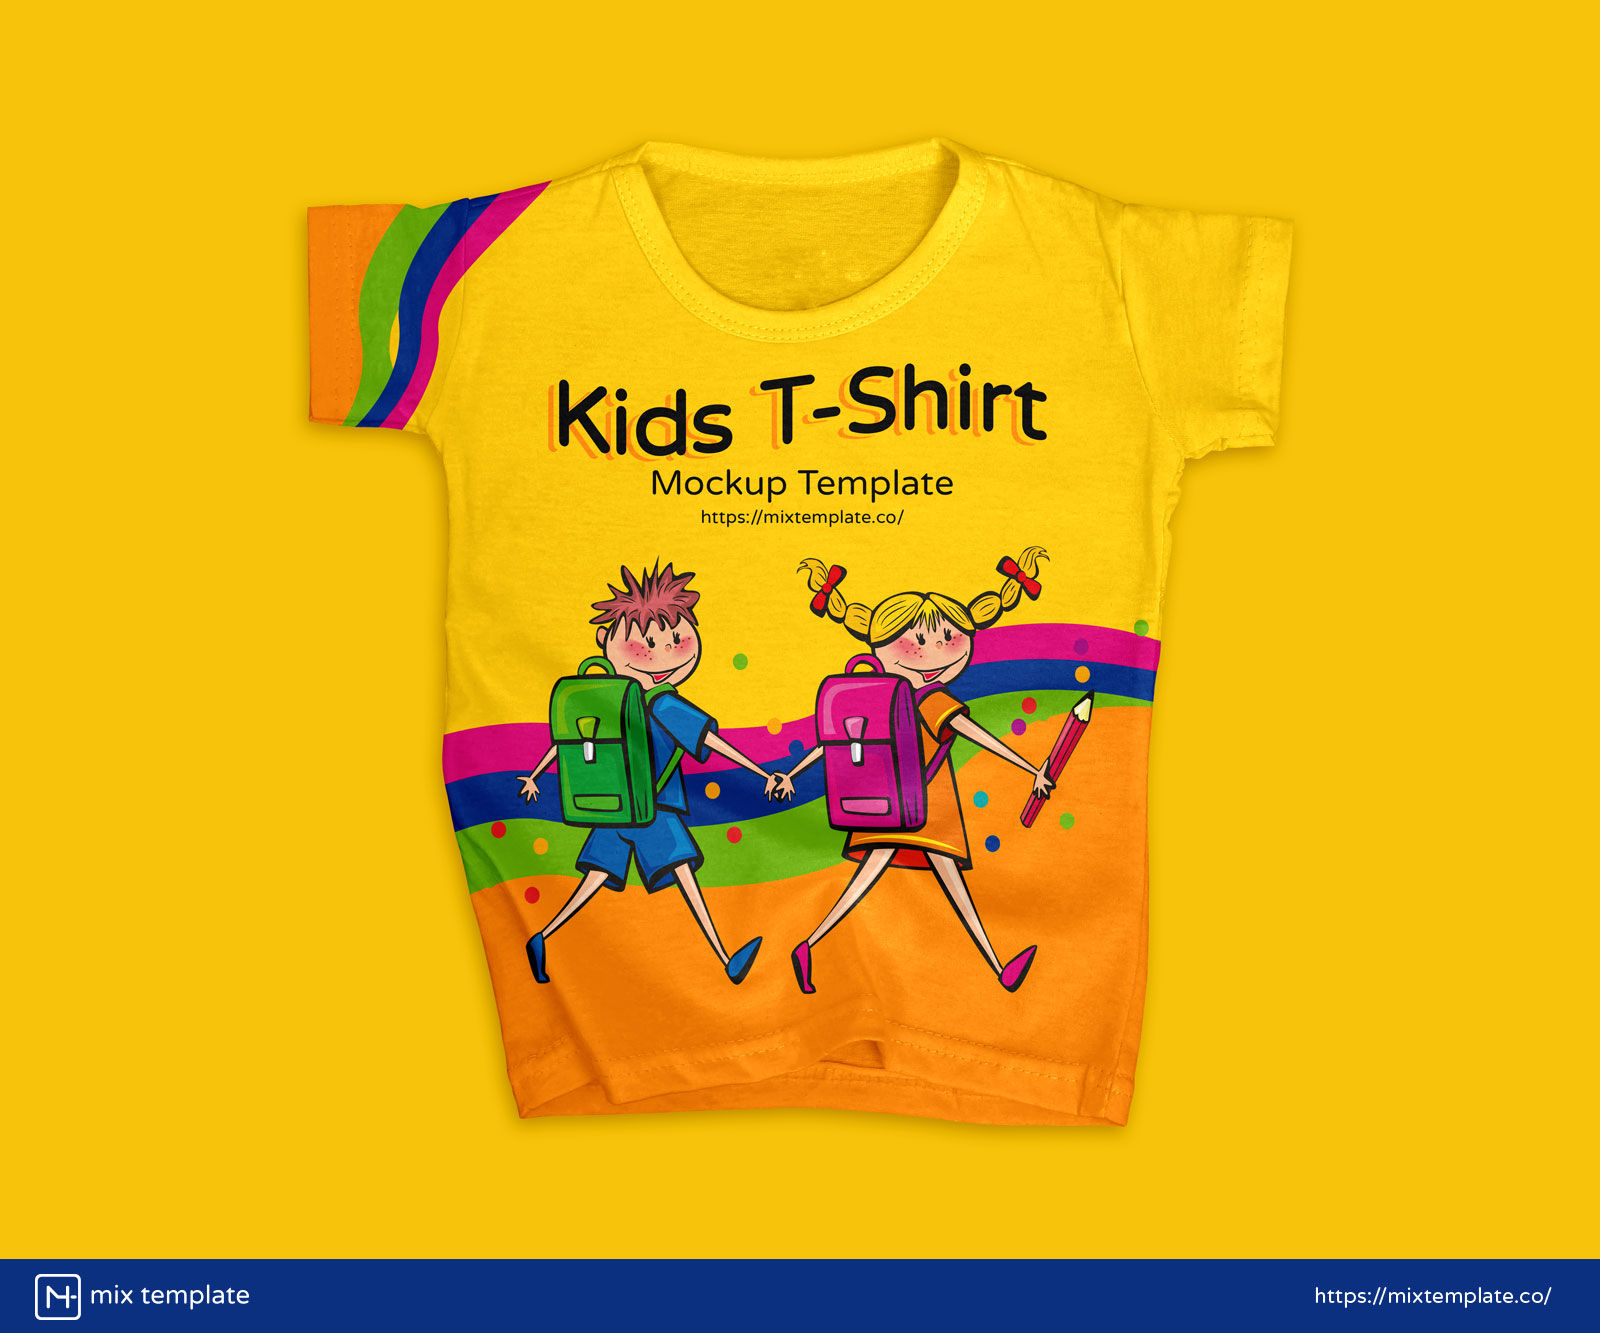 Free-Modern-Kids-T-Shirt-Mockup-Template-38